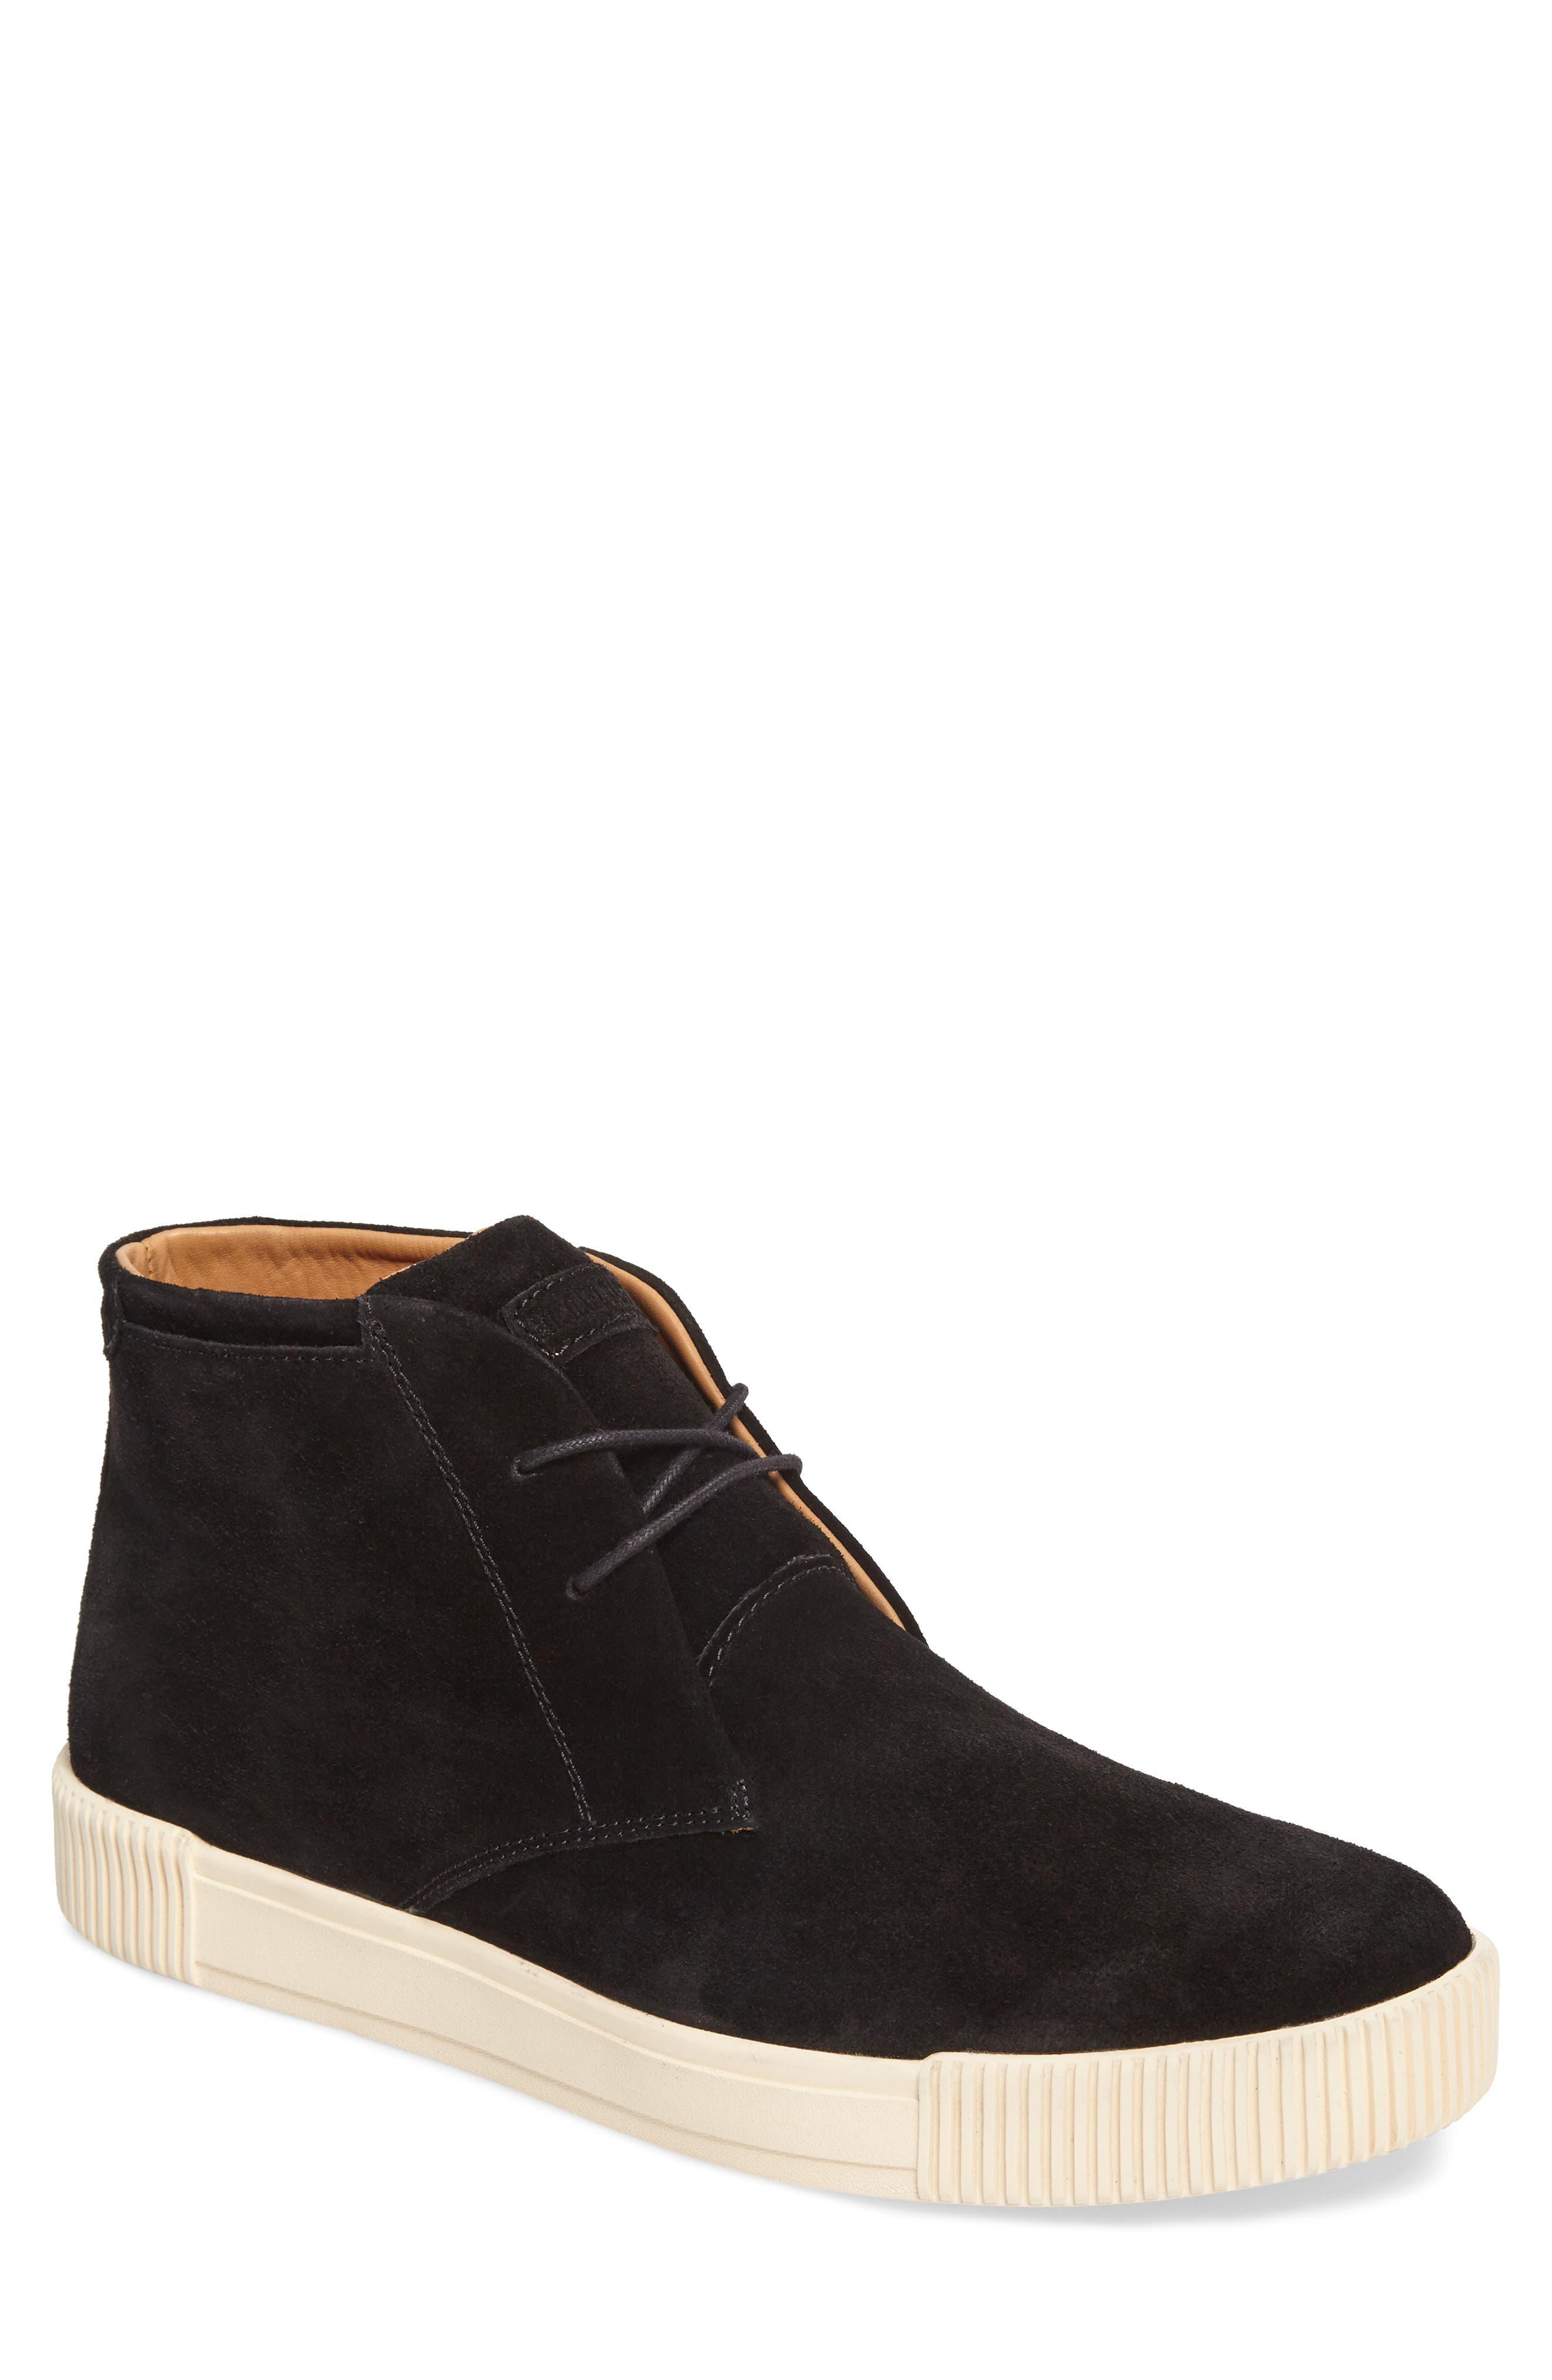 Lyons Chukka Sneaker,                             Main thumbnail 1, color,                             001